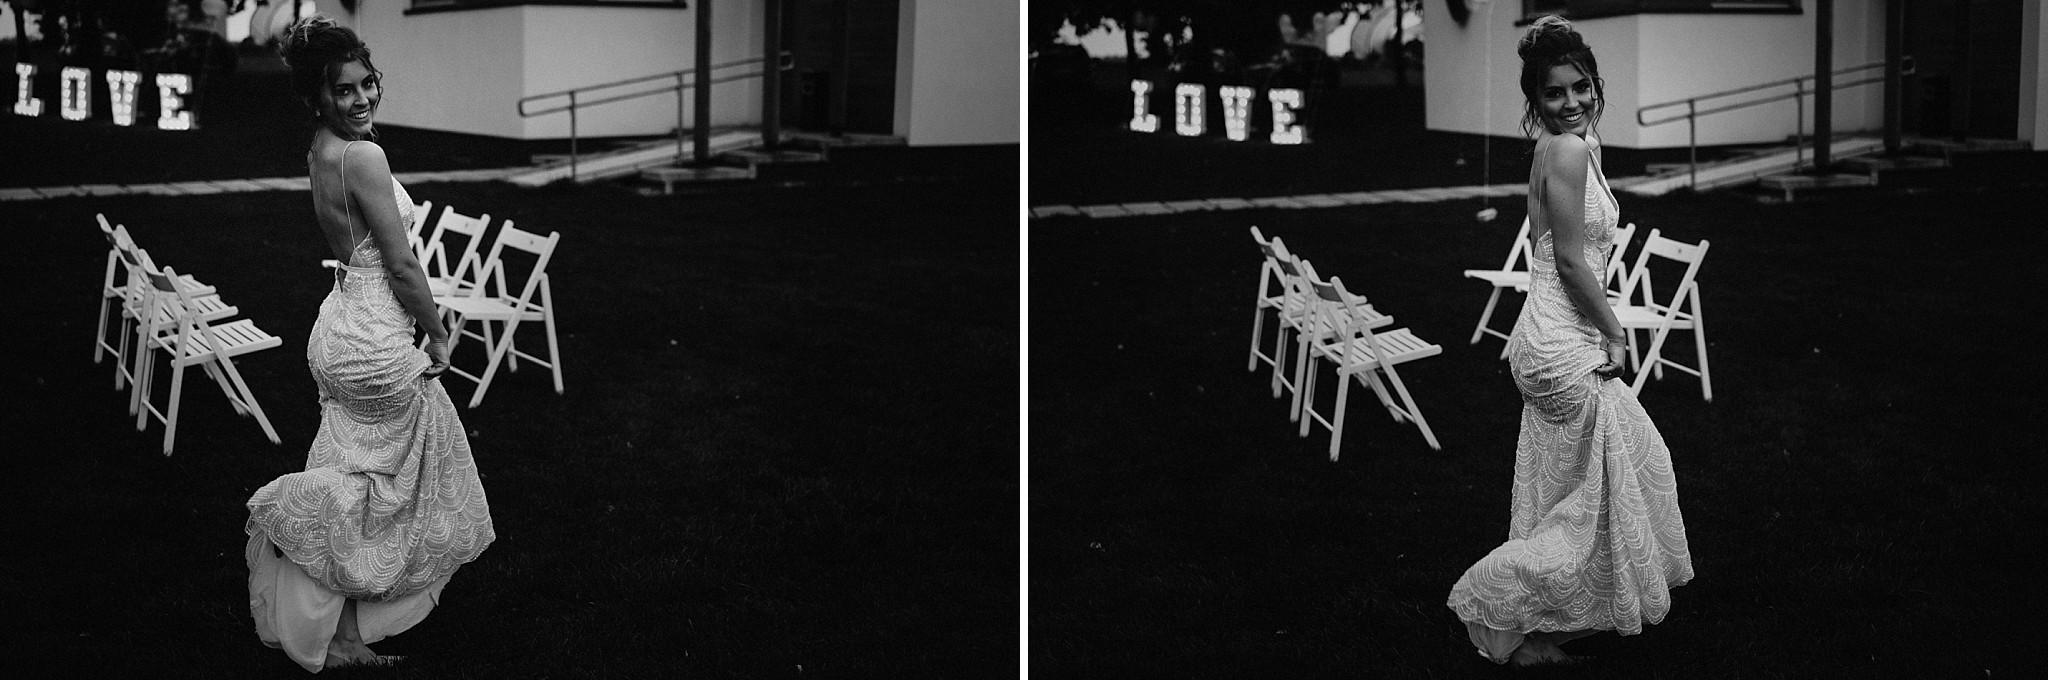 fotograf poznan wesele dobra truskawka piekne wesele pod poznaniem wesele w dobrej truskawce piekna para mloda slub marzen slub koronawirus slub listopad wesele koronawirus 363